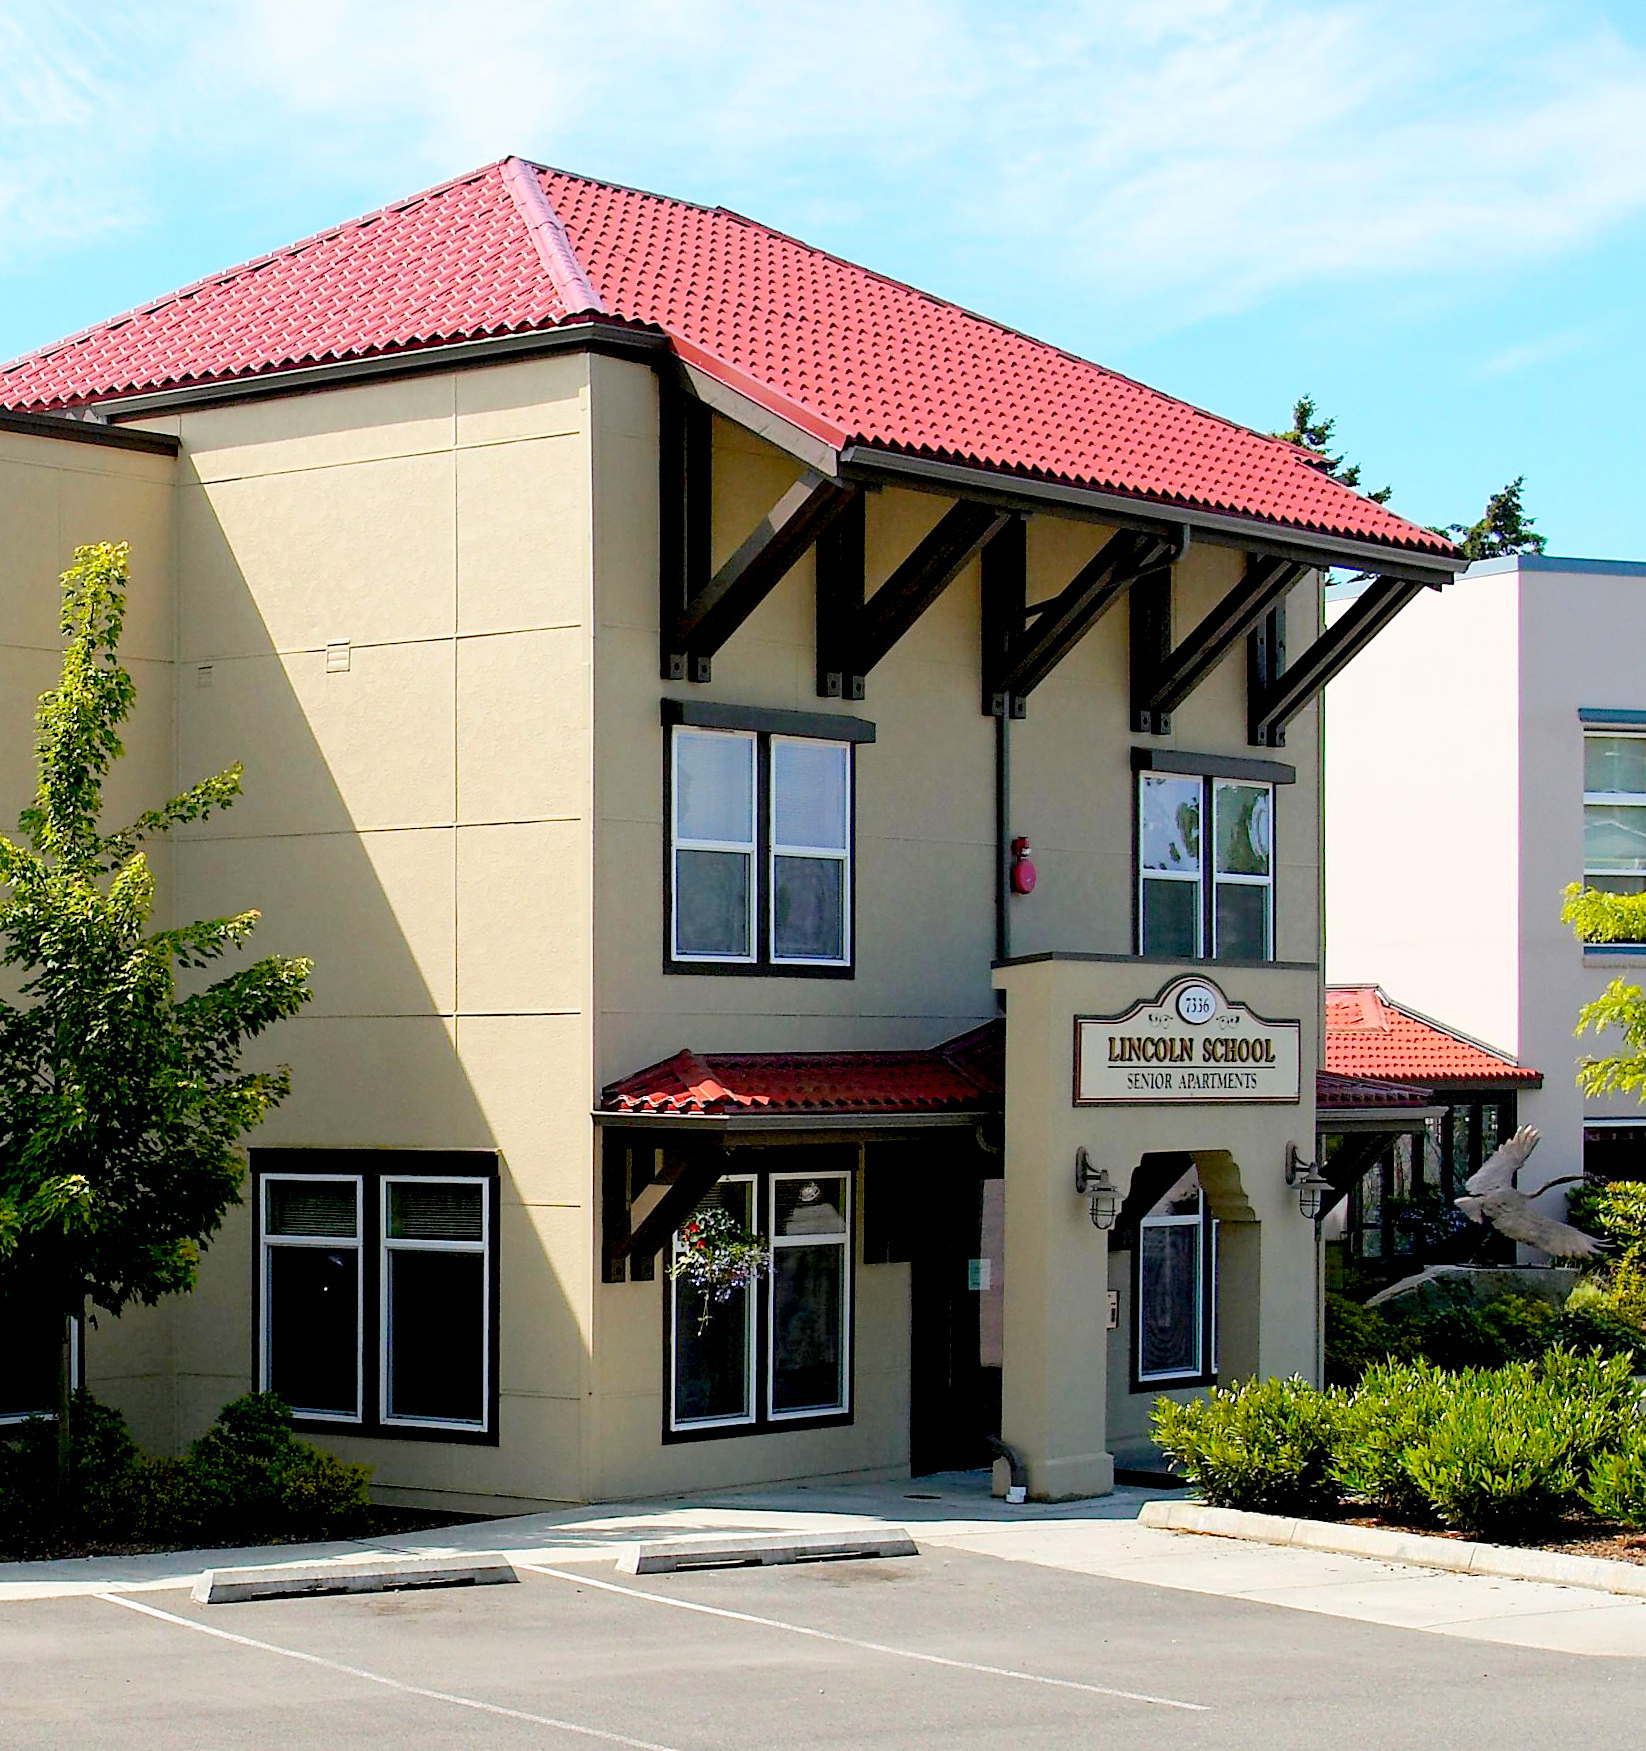 LINCOLN SCHOOL APARTMENTS | Stanwood, WA